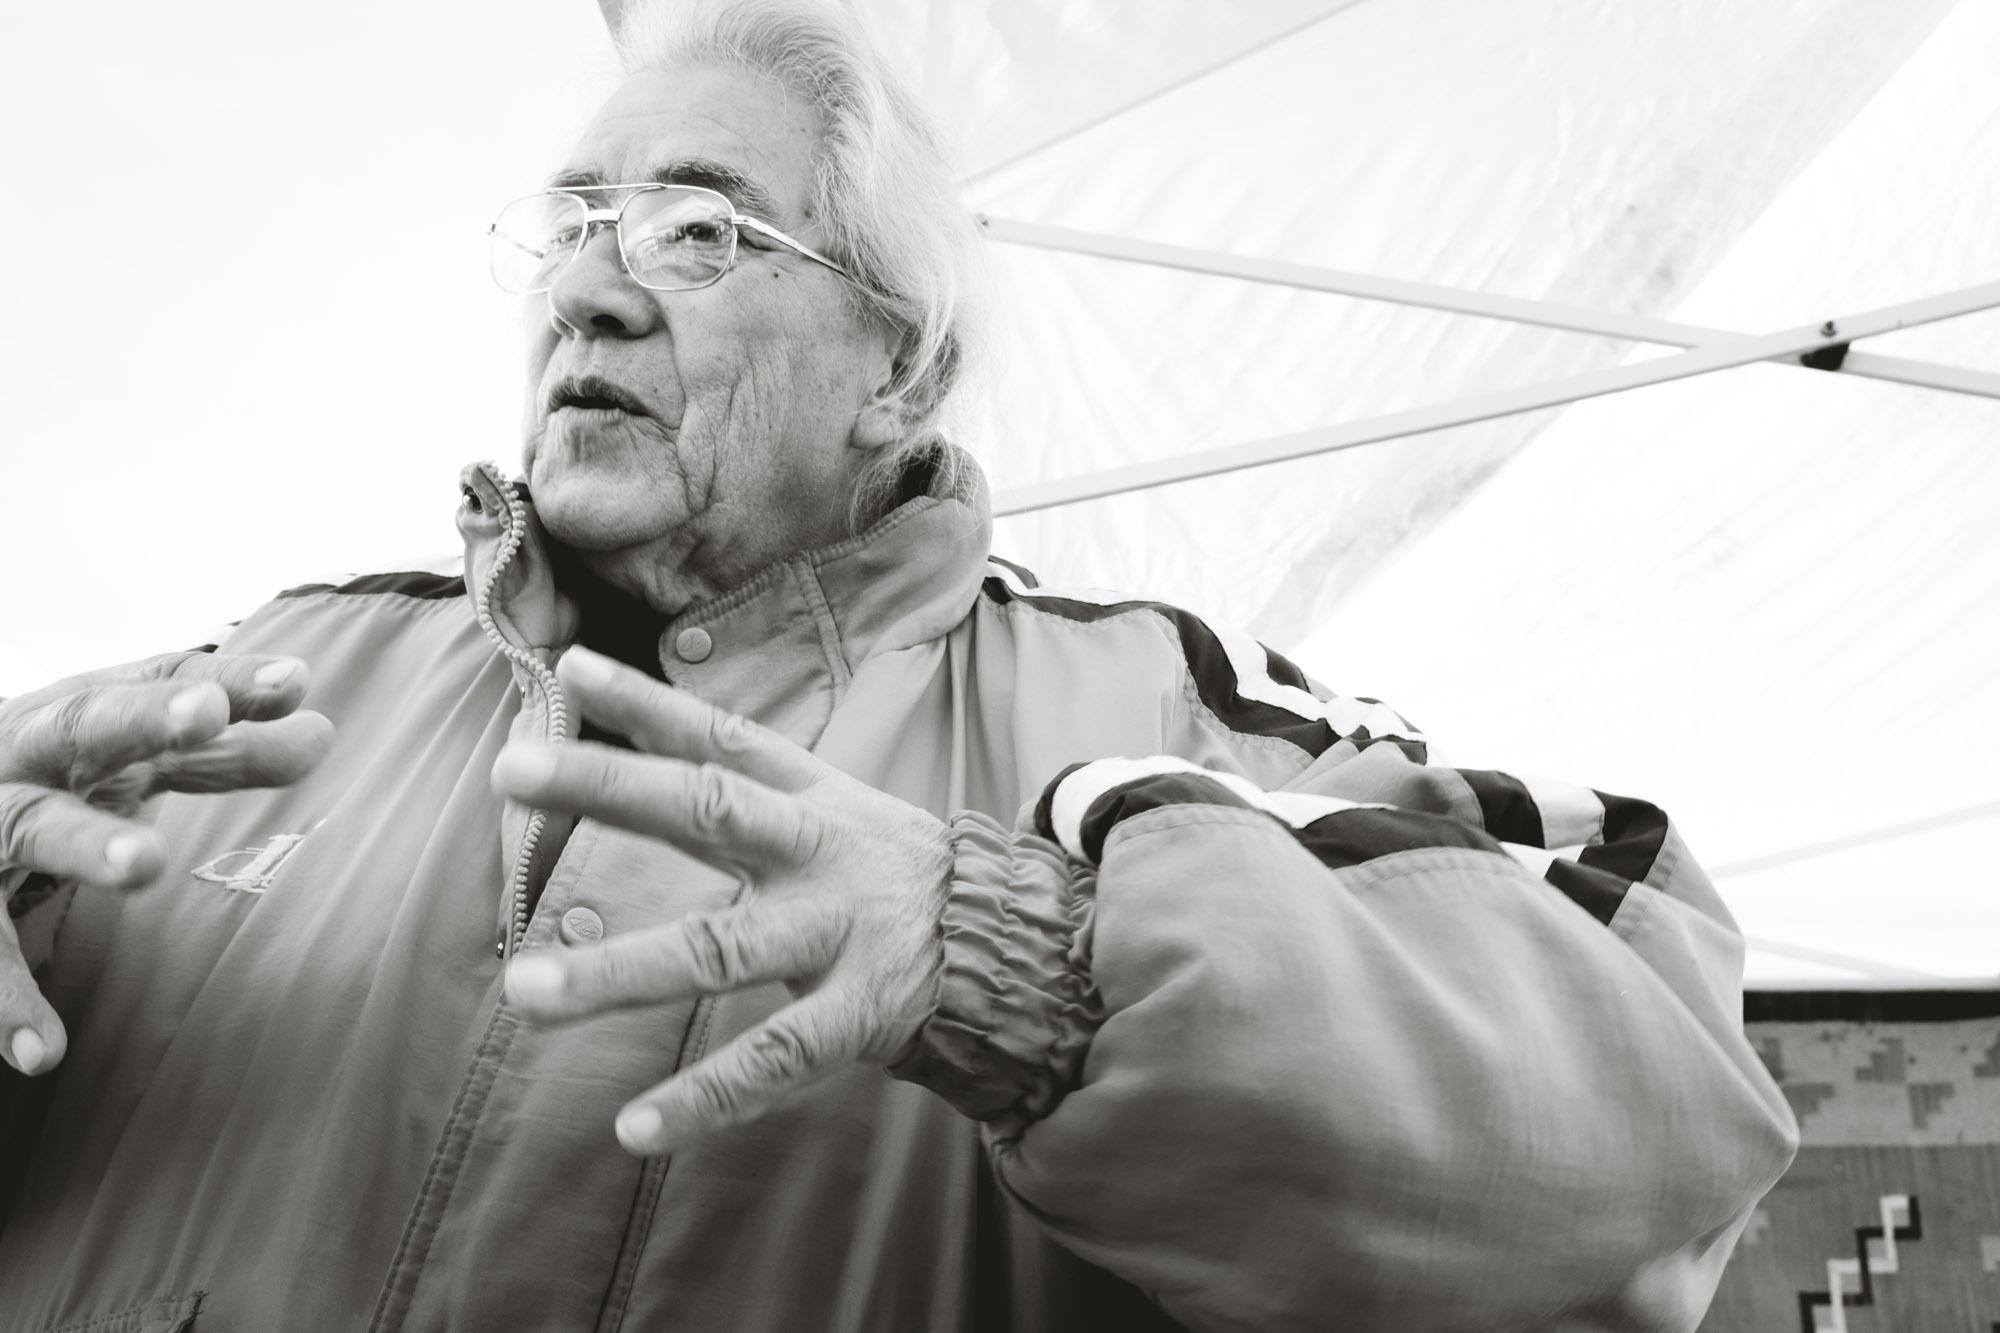 Native MAerican Man at Long Beach Antique Swap Meet